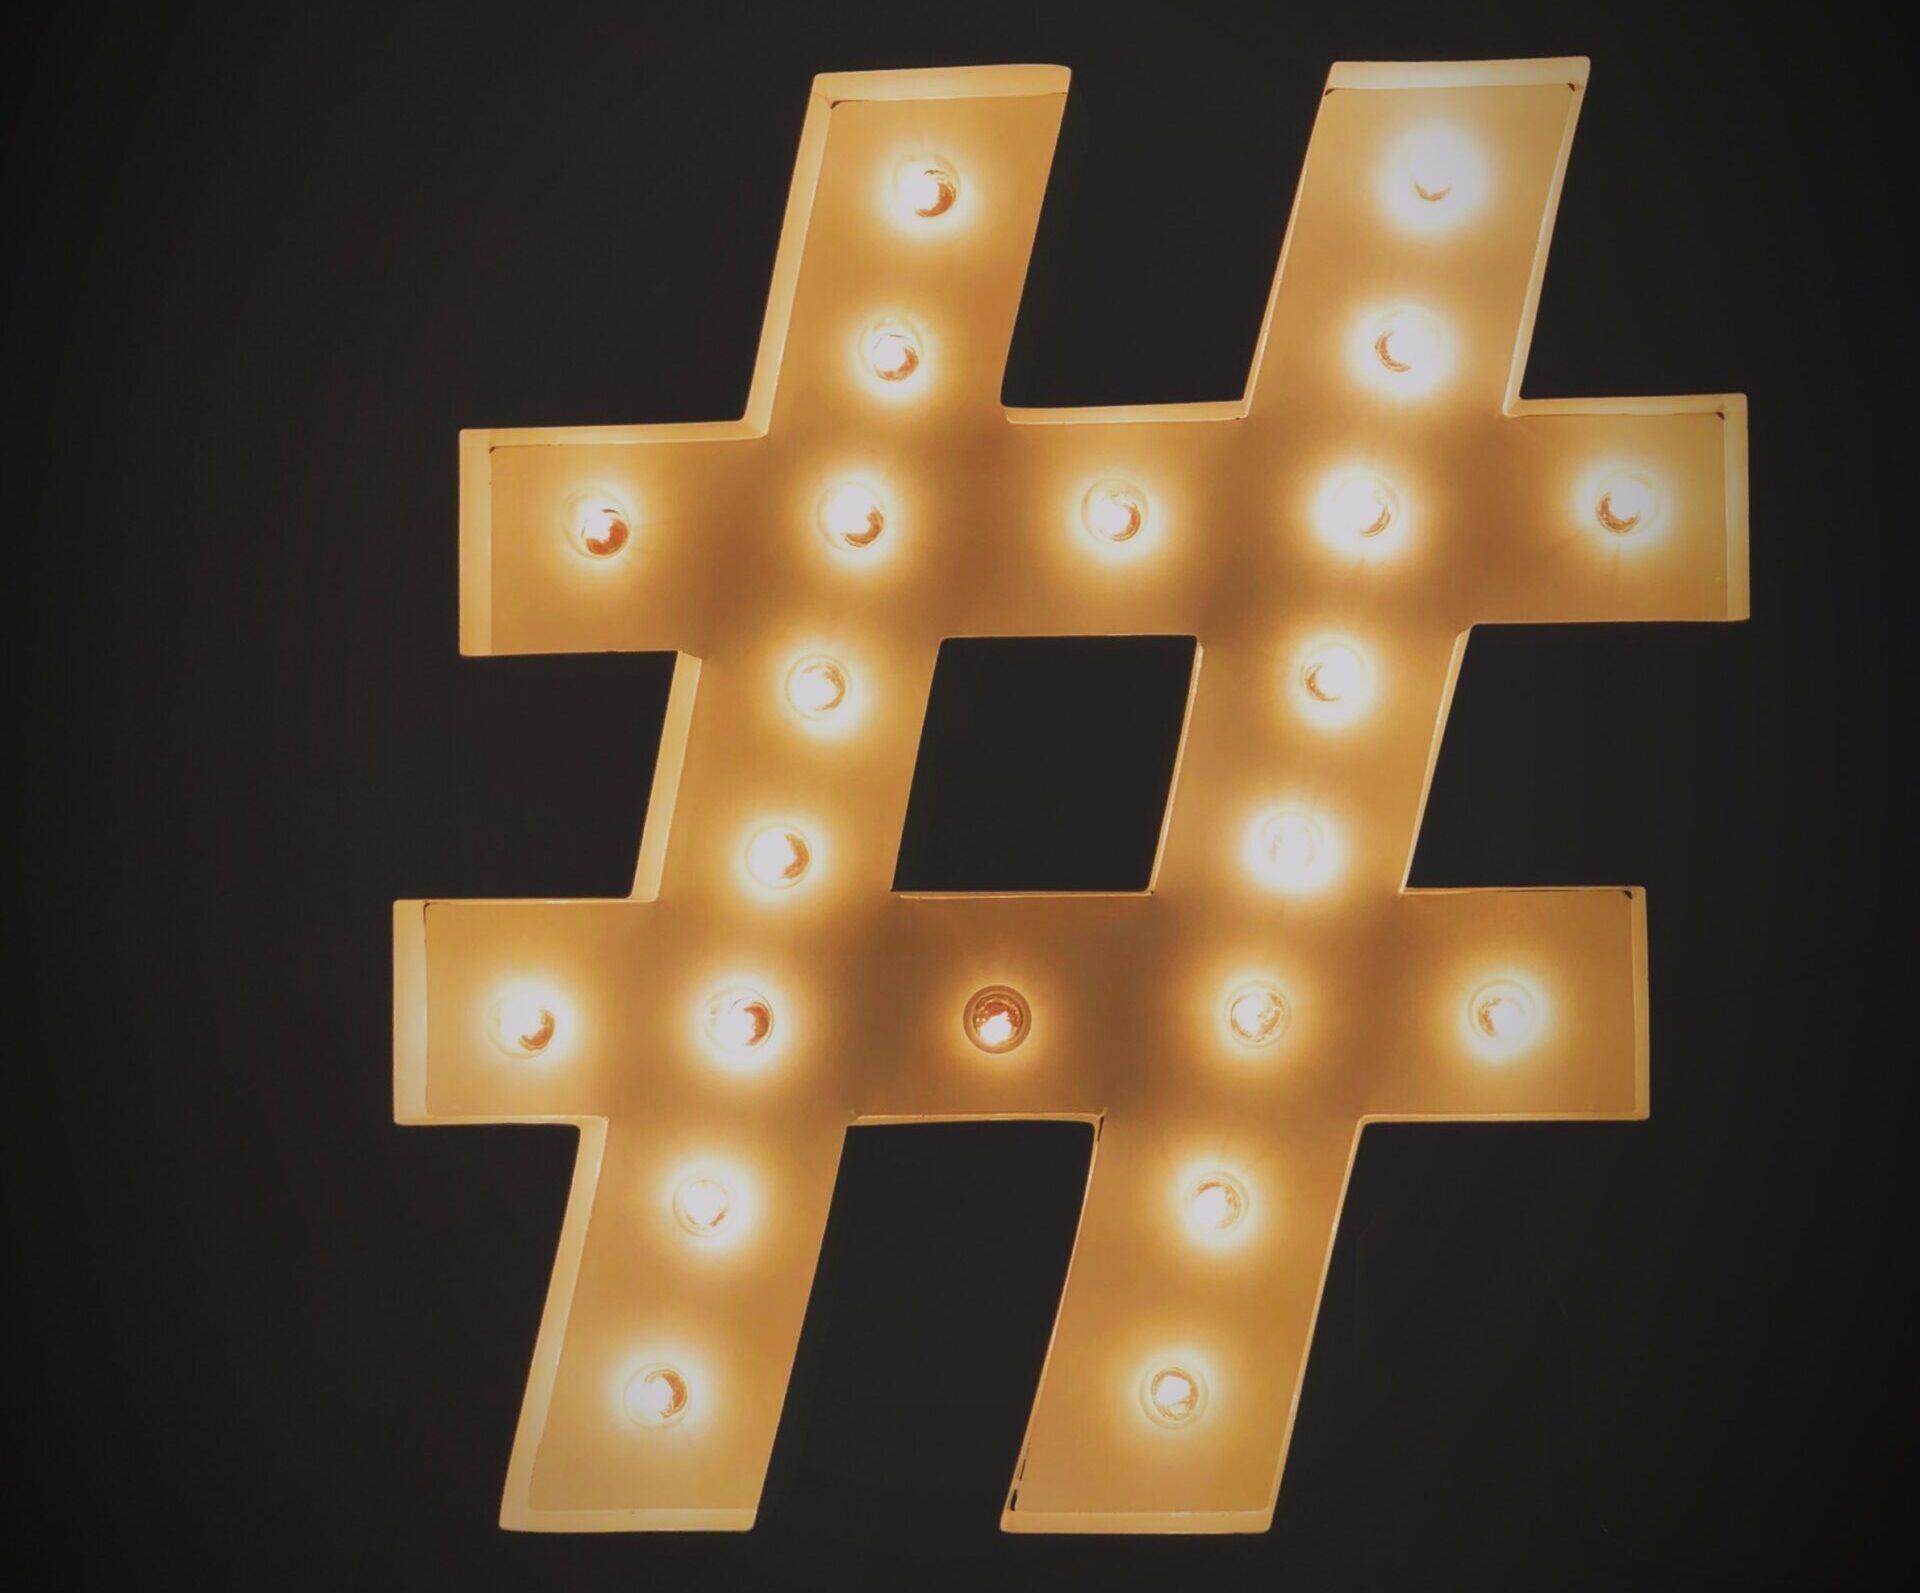 Hashtag on Instagram